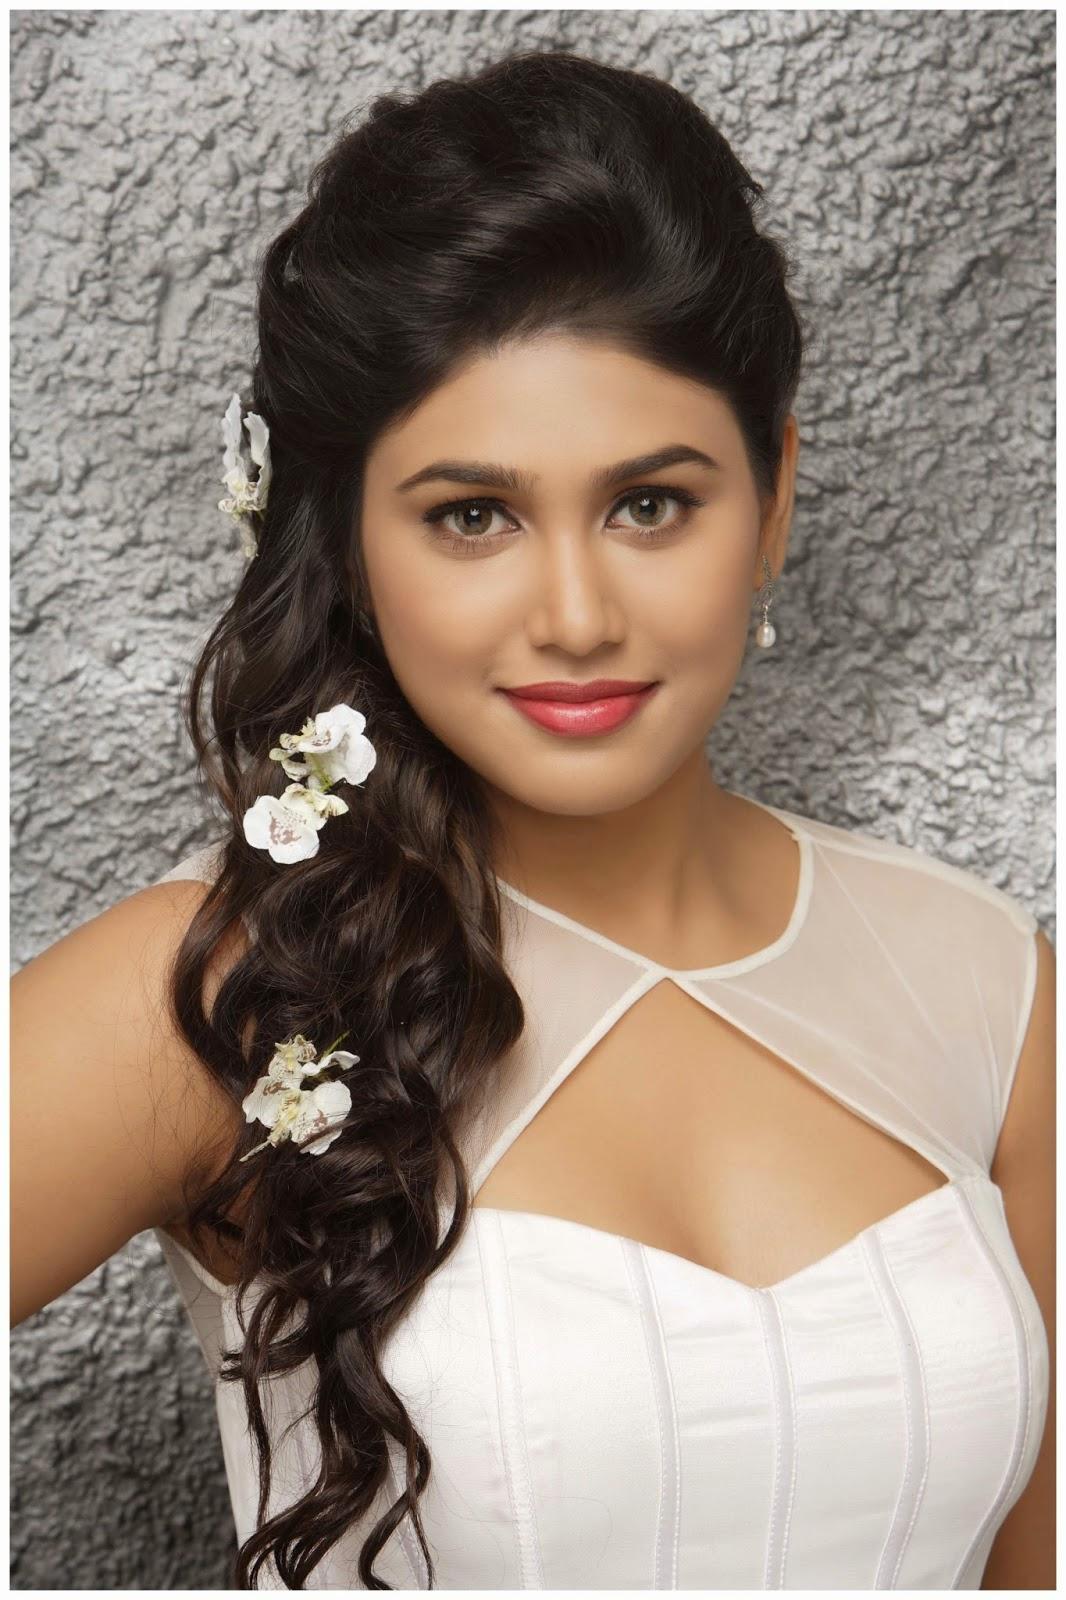 manisha-yadav-hot-photoshoot-stills-25